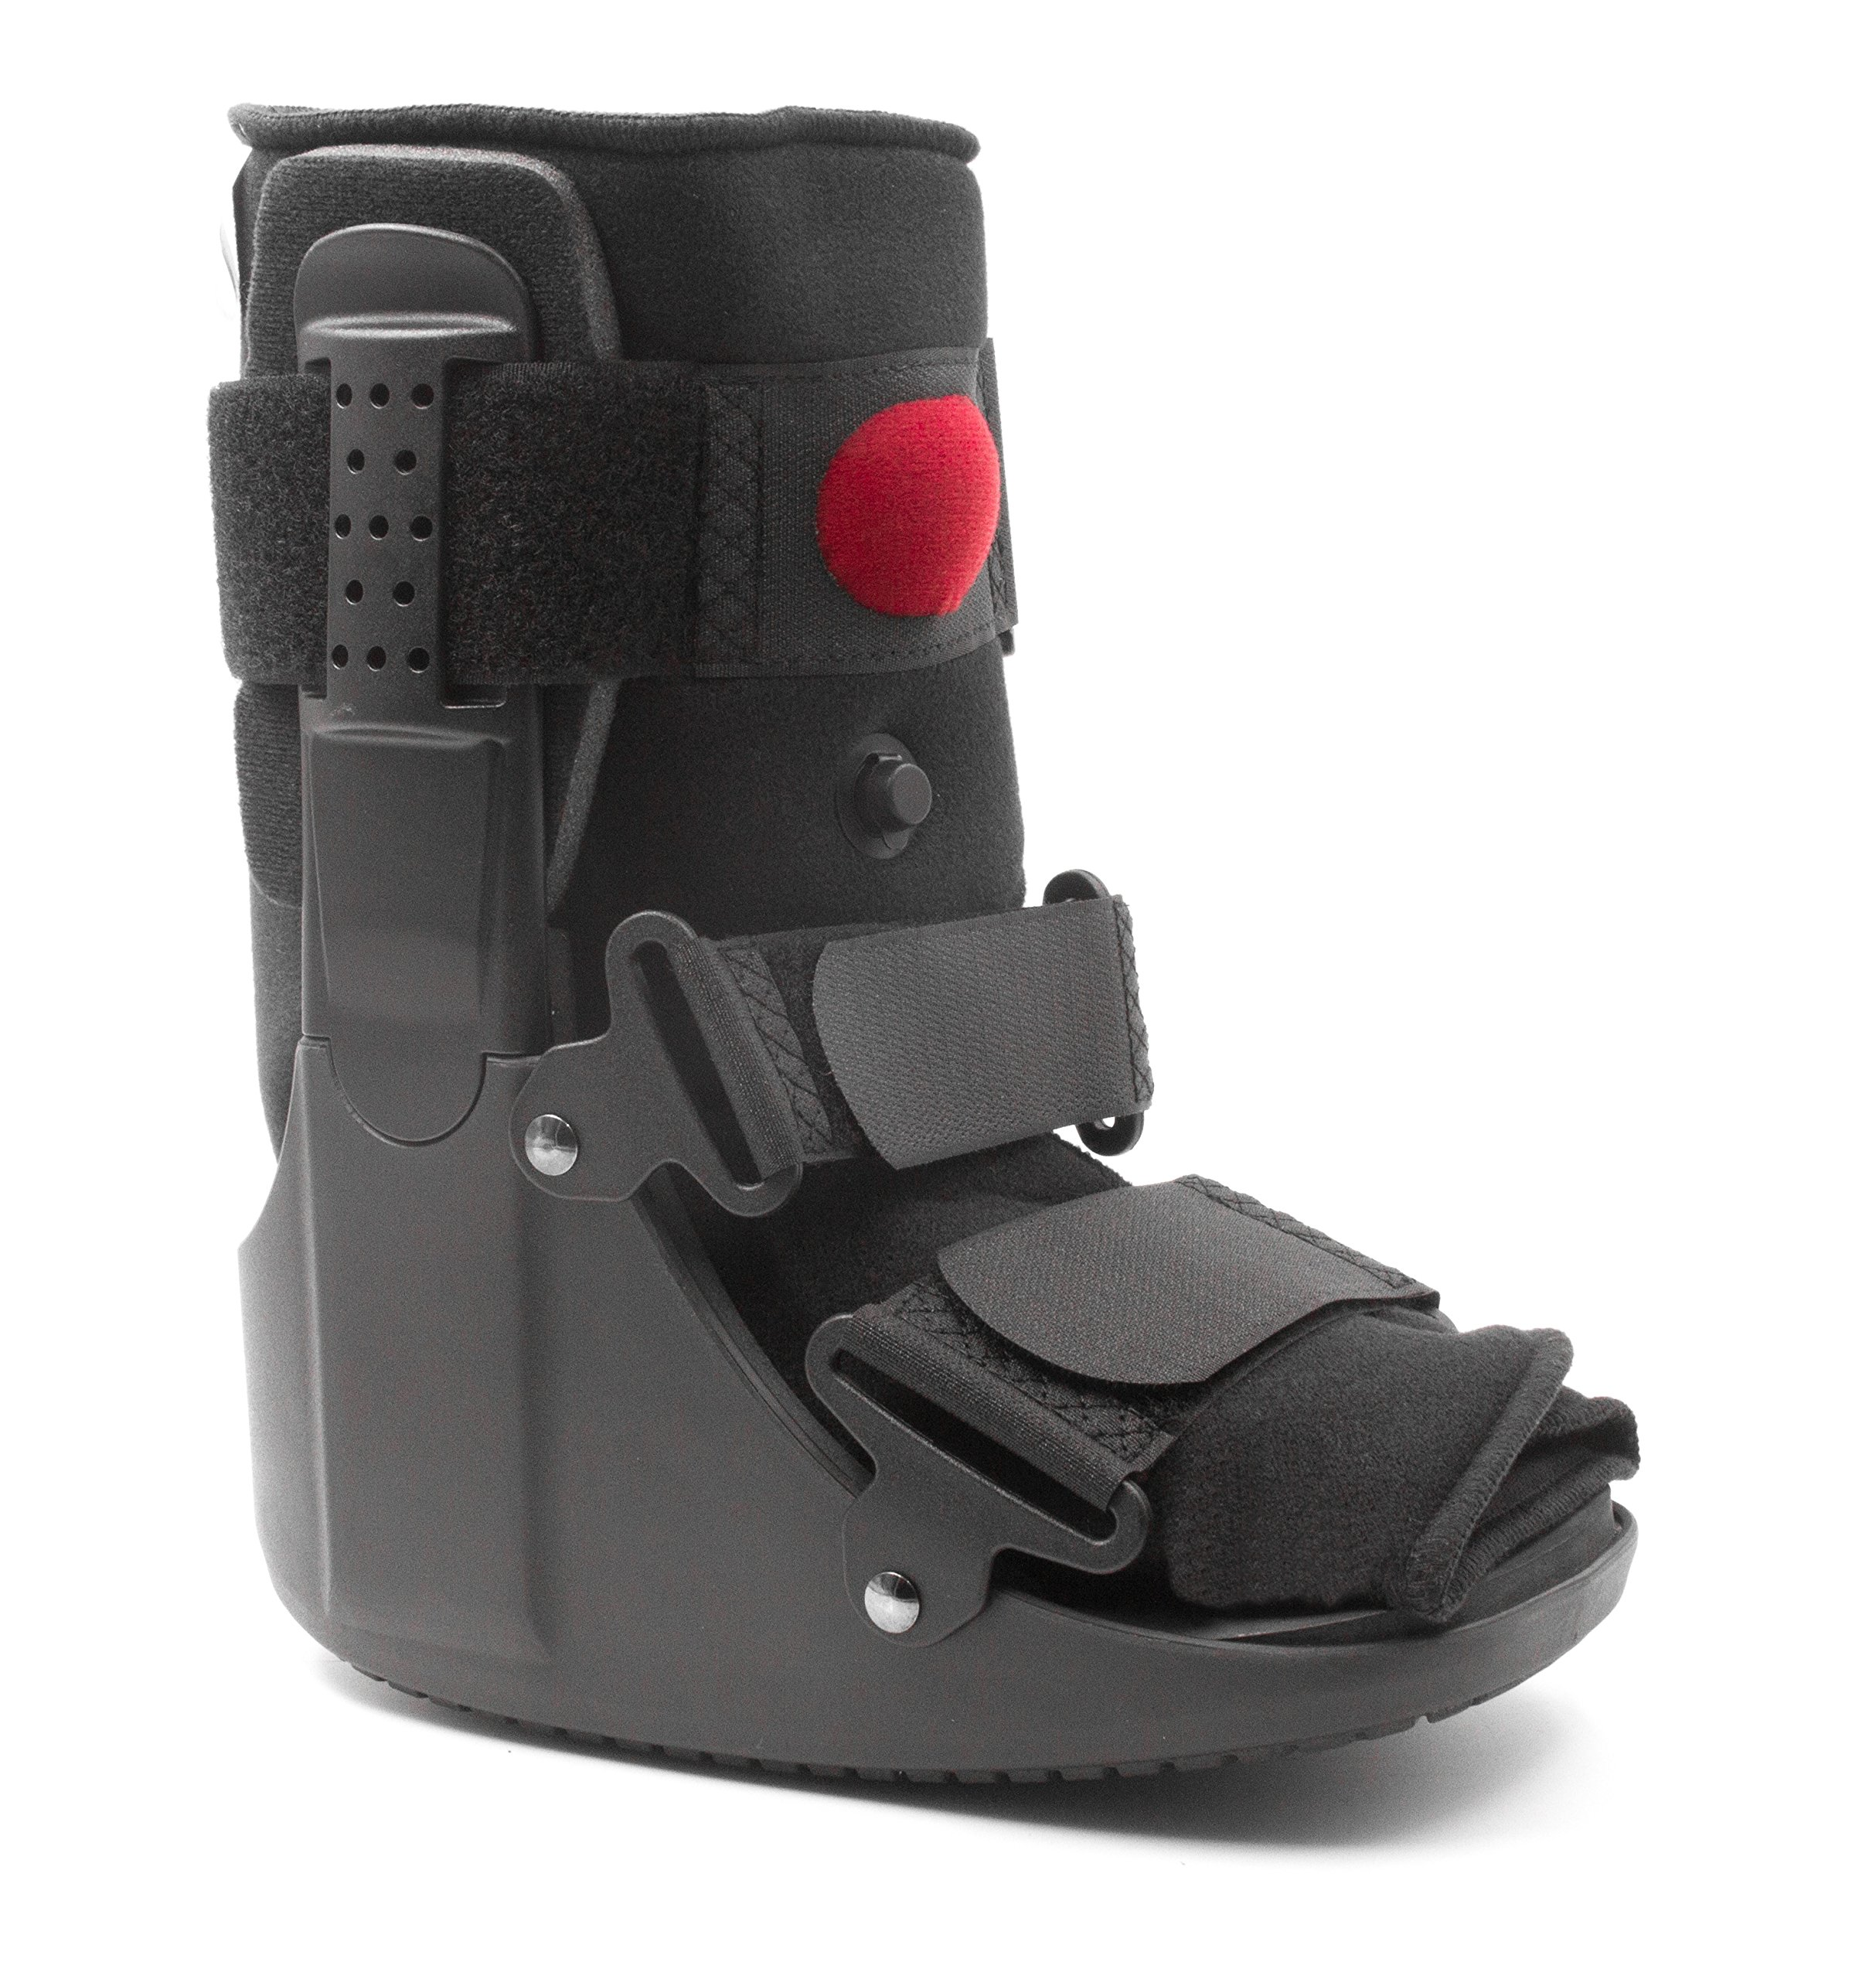 Mars Wellness Premium Short Air Cam Walker Fracture Ankle/Foot Stabilizer Boot - Medium by MARS Wellness